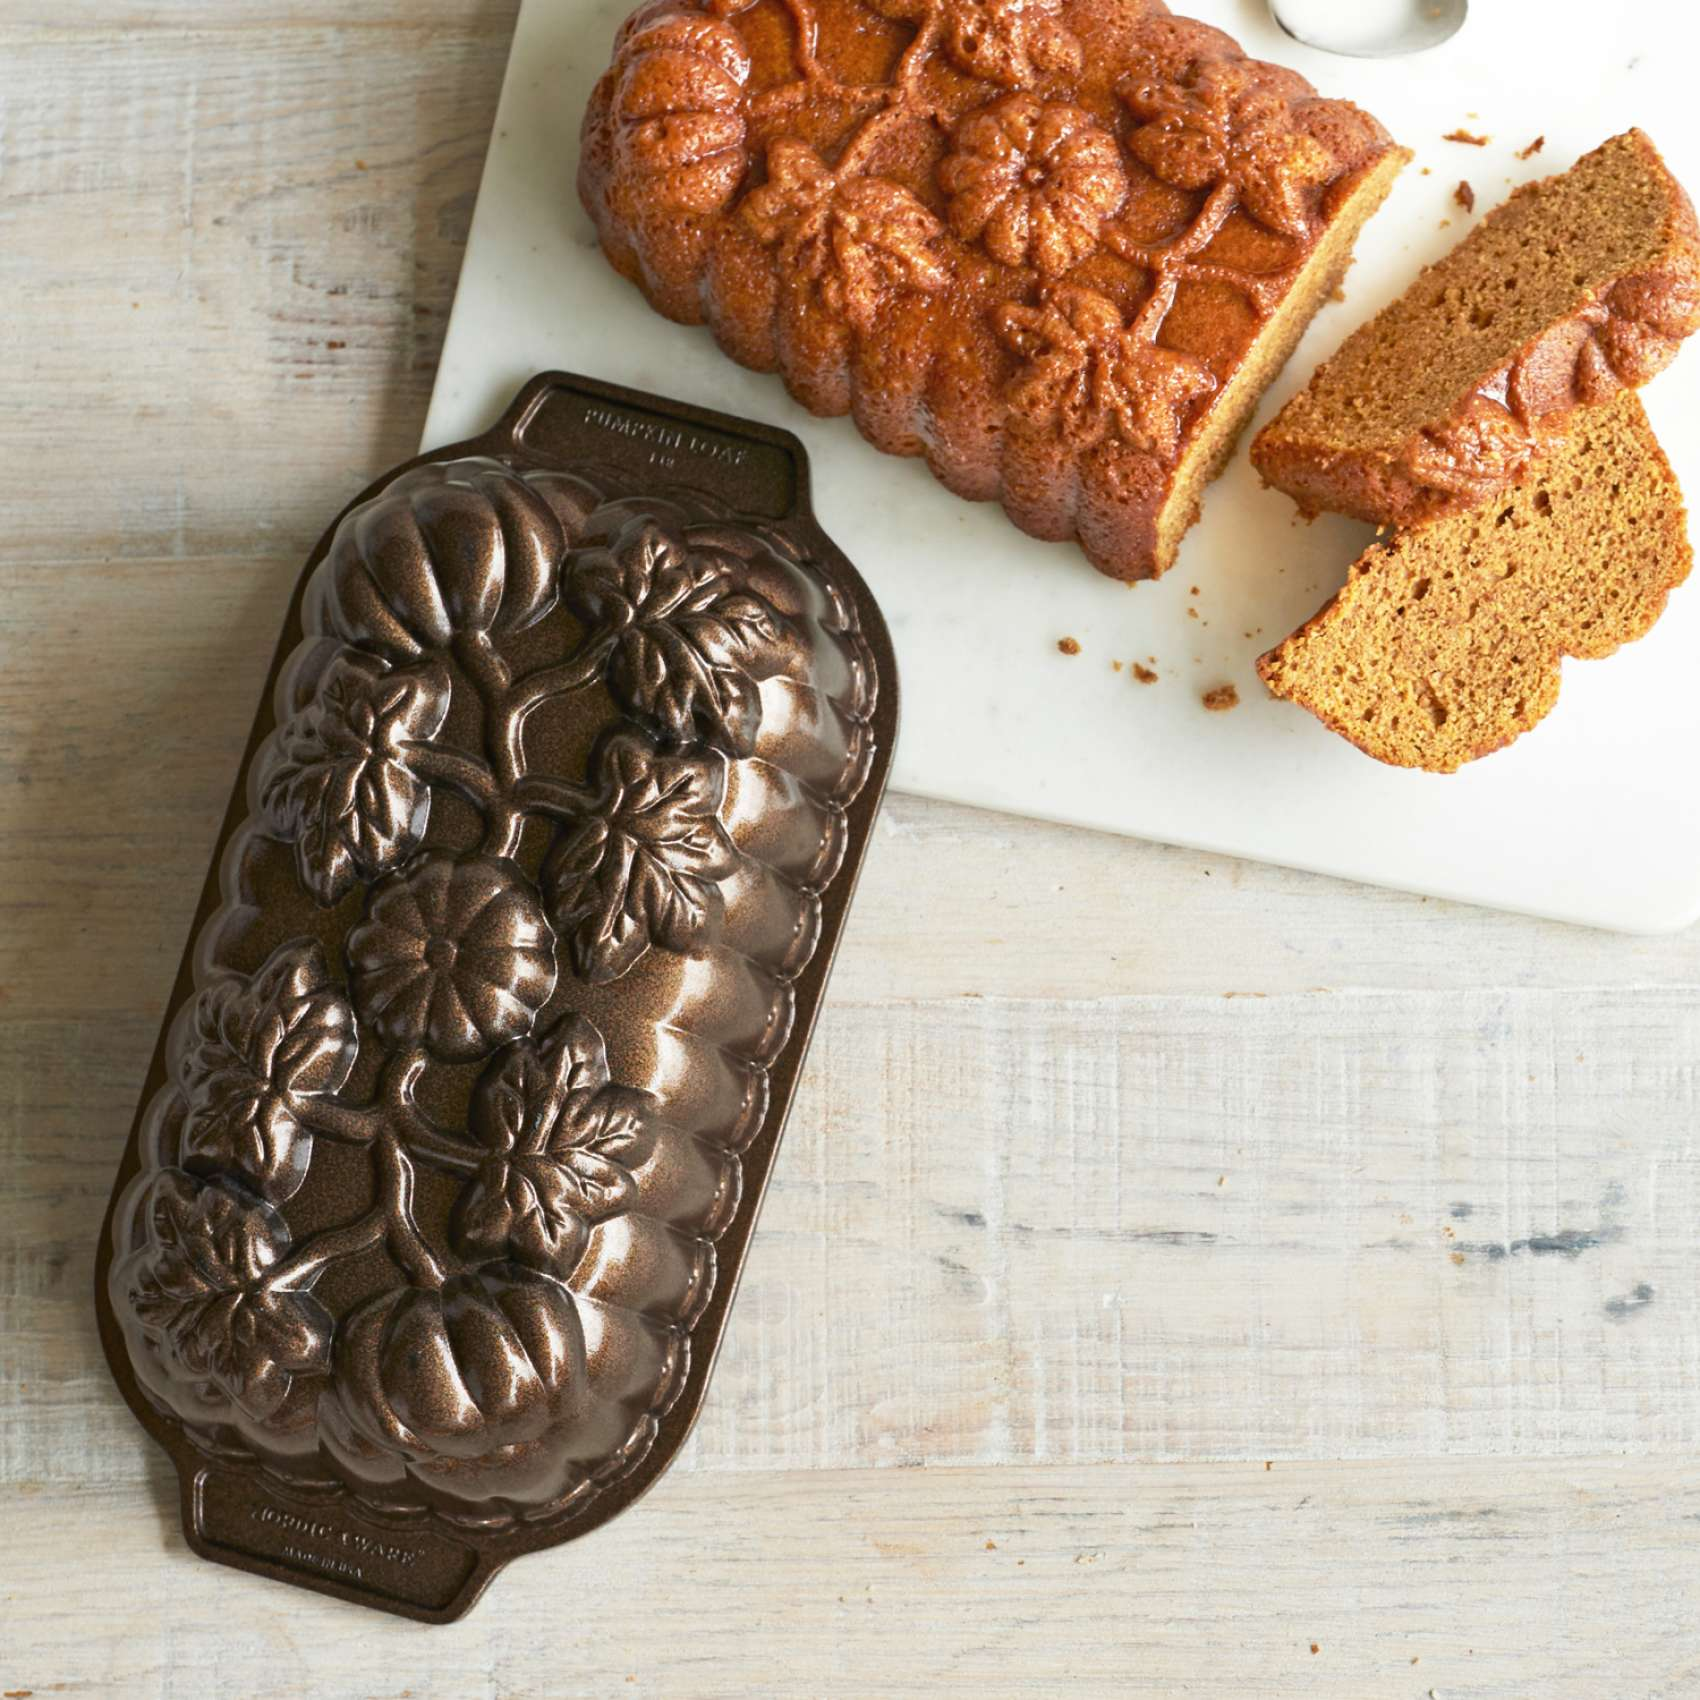 Nordic Ware Pumpkin Loaf Pan, Bronze Finish | Sur La Table